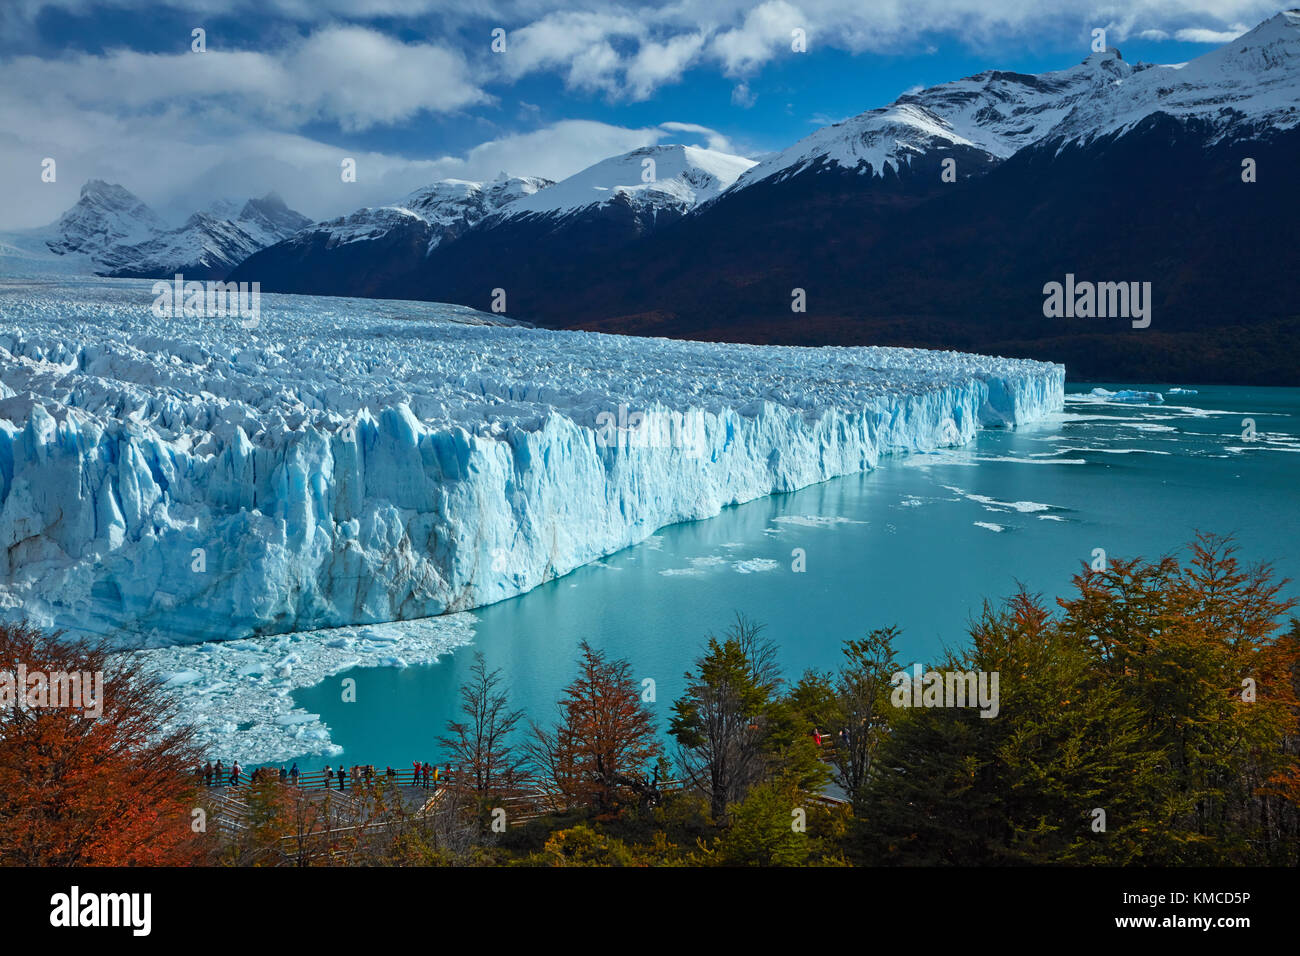 Perito Moreno Glacier, lenga trees in autumn, and tourists on walkway, Parque Nacional Los Glaciares (World Heritage - Stock Image